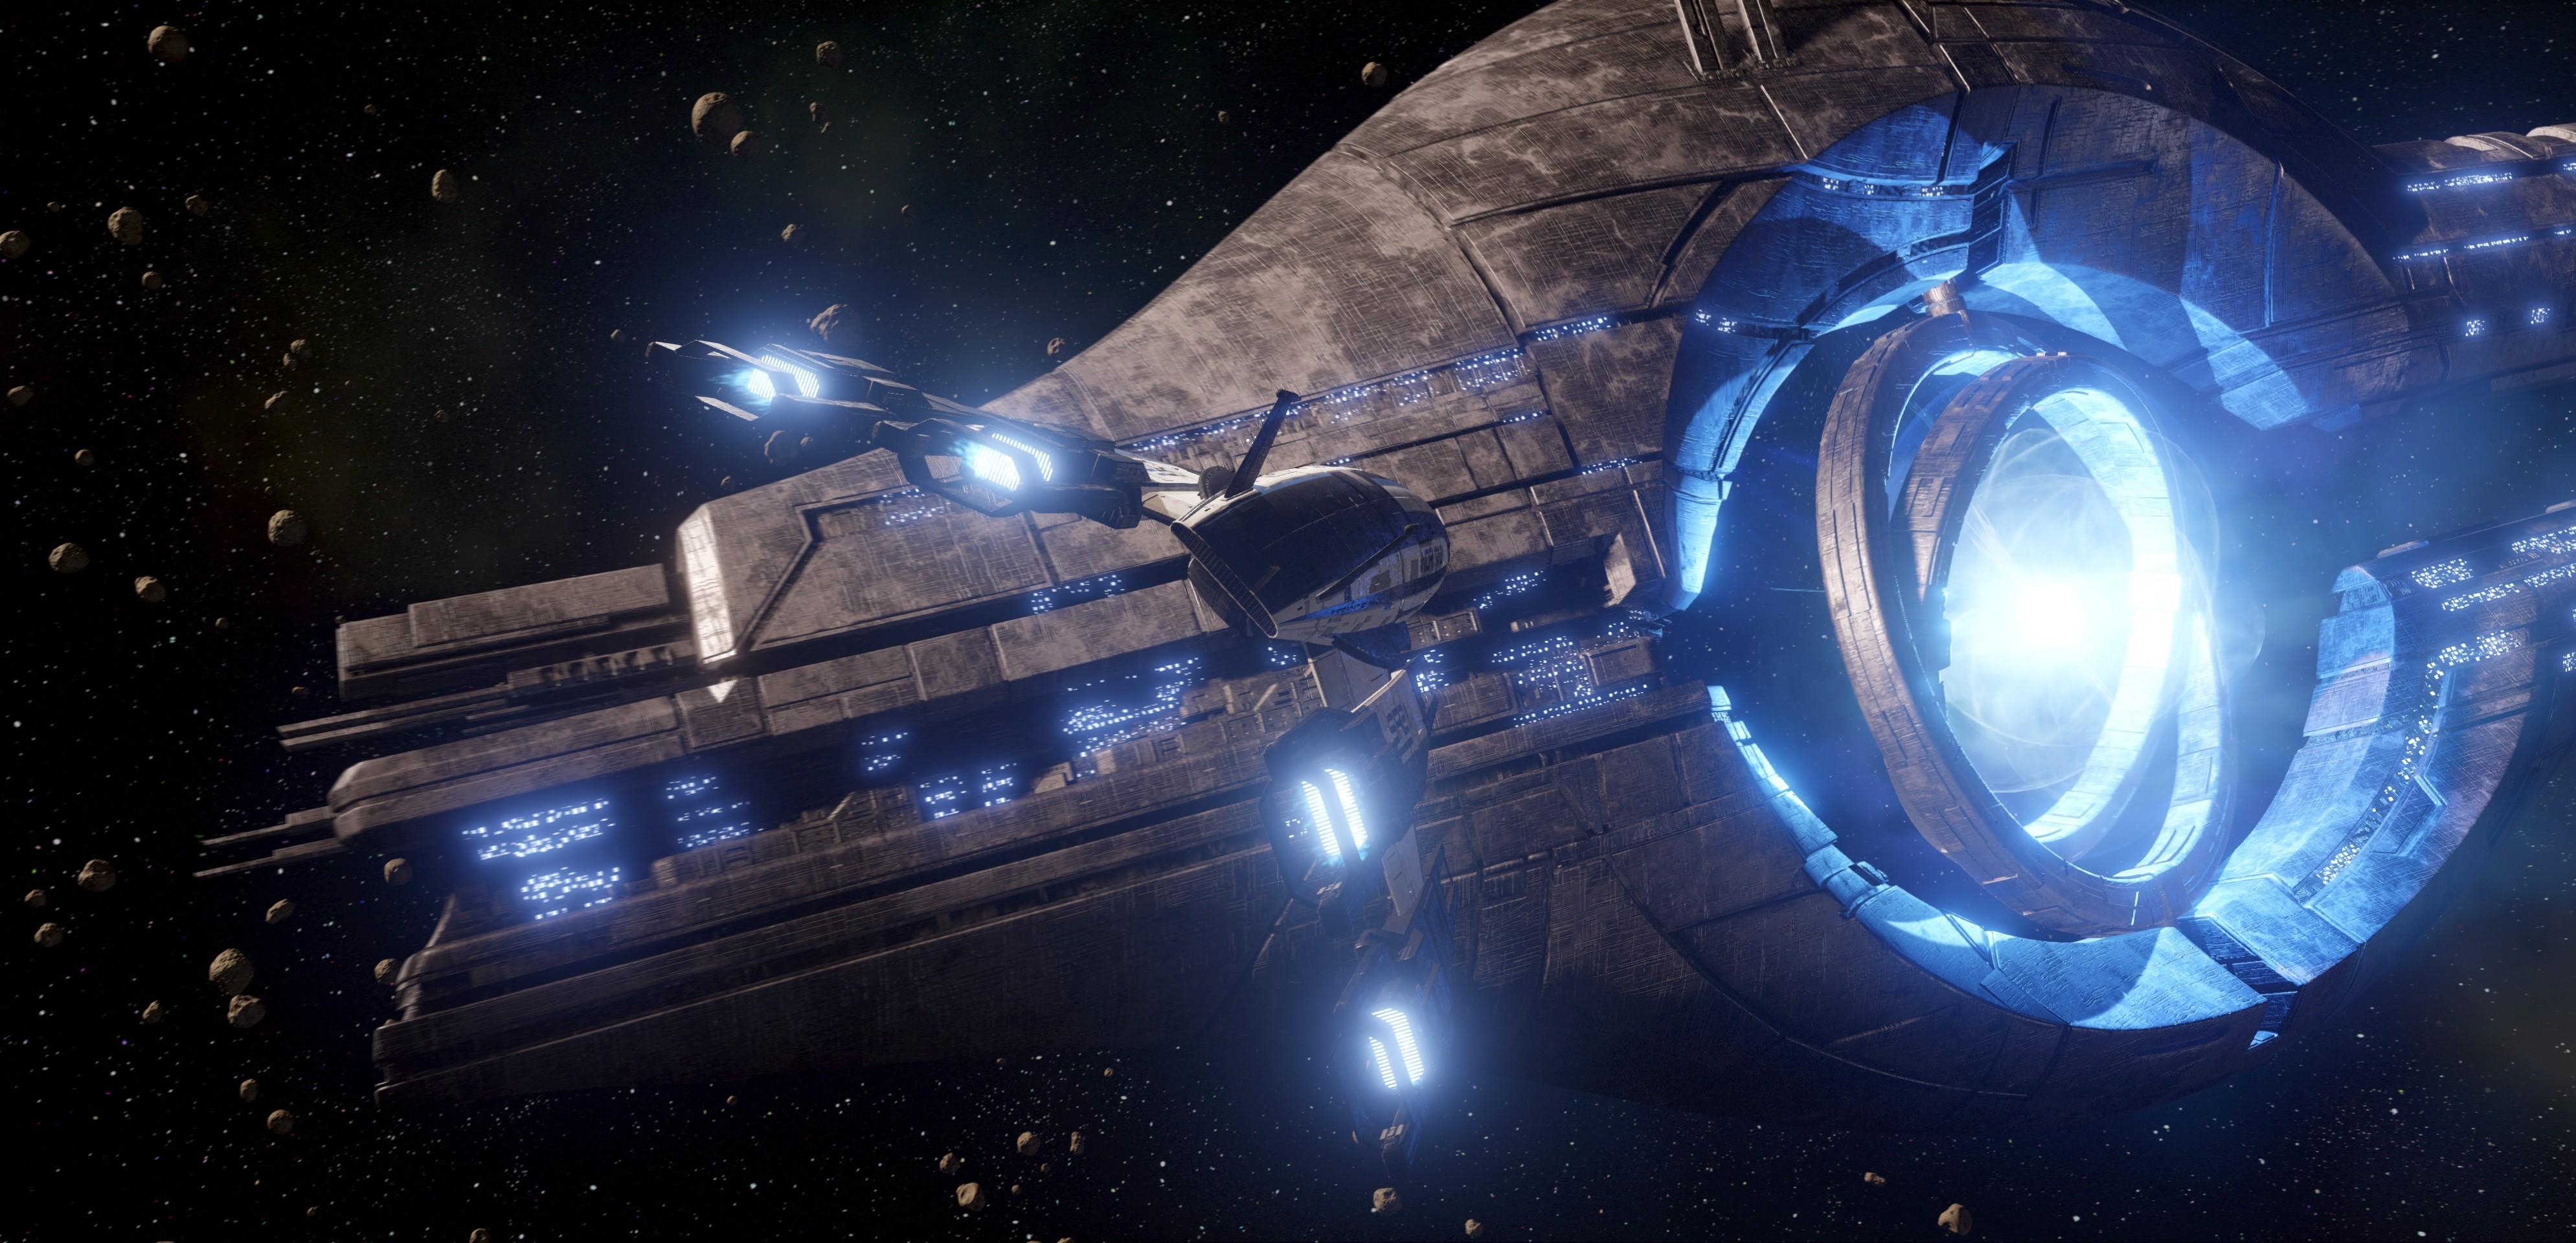 Wallpaper star citizen game space simulator battle sci - Spaceship wallpaper 4k ...